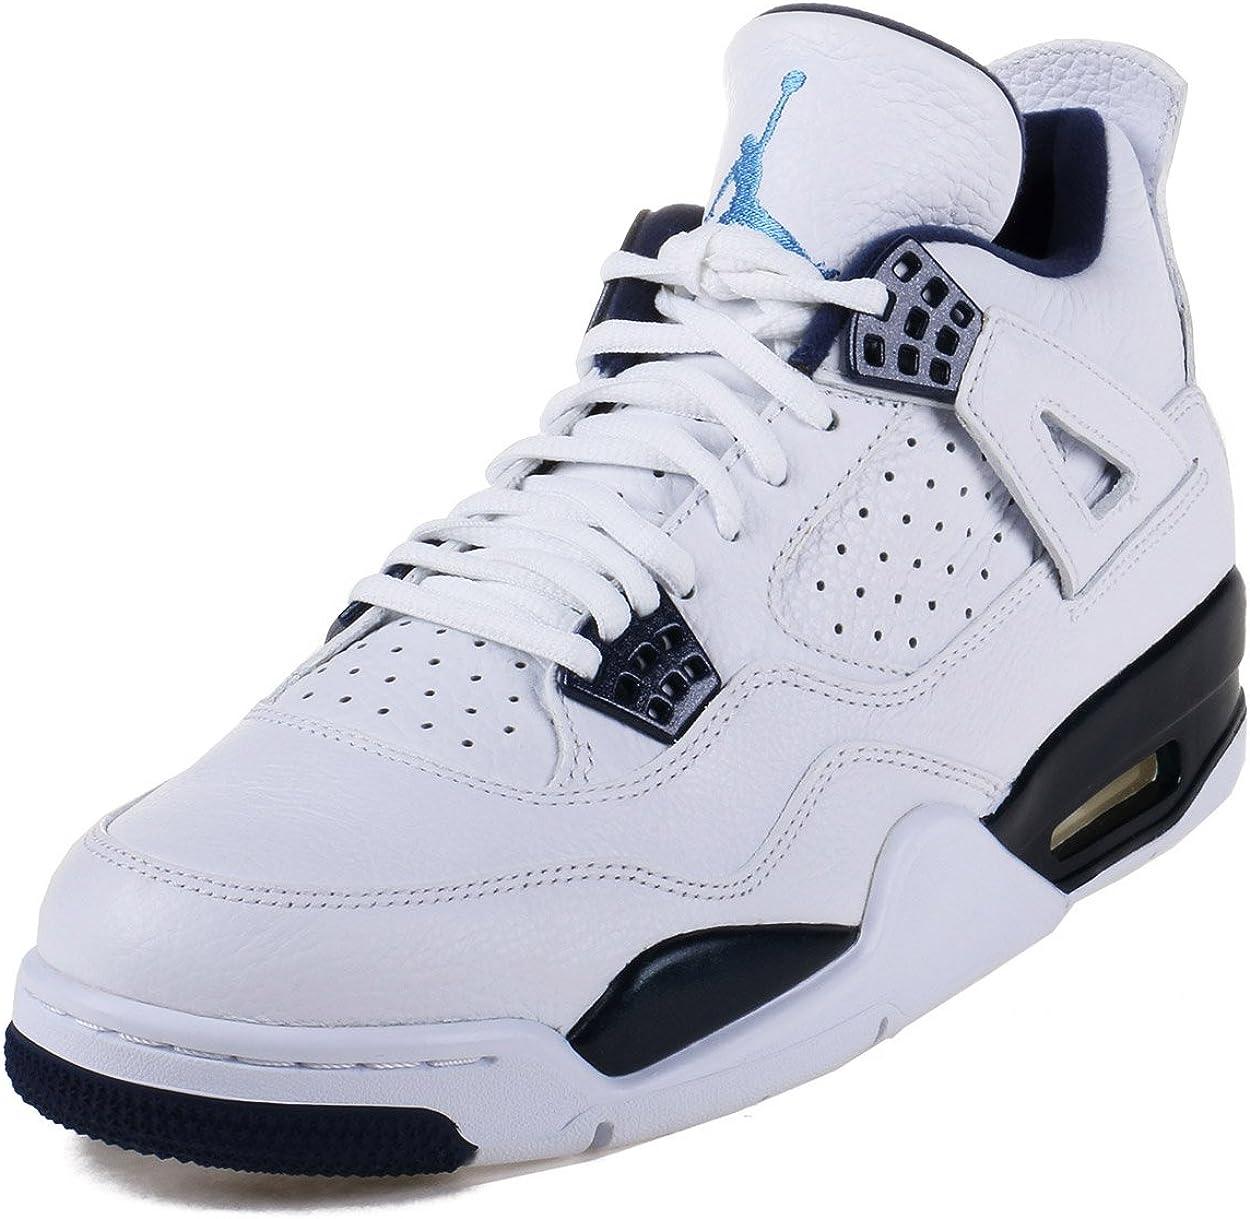 Nike Mens Air Jordan 4 Retro LS